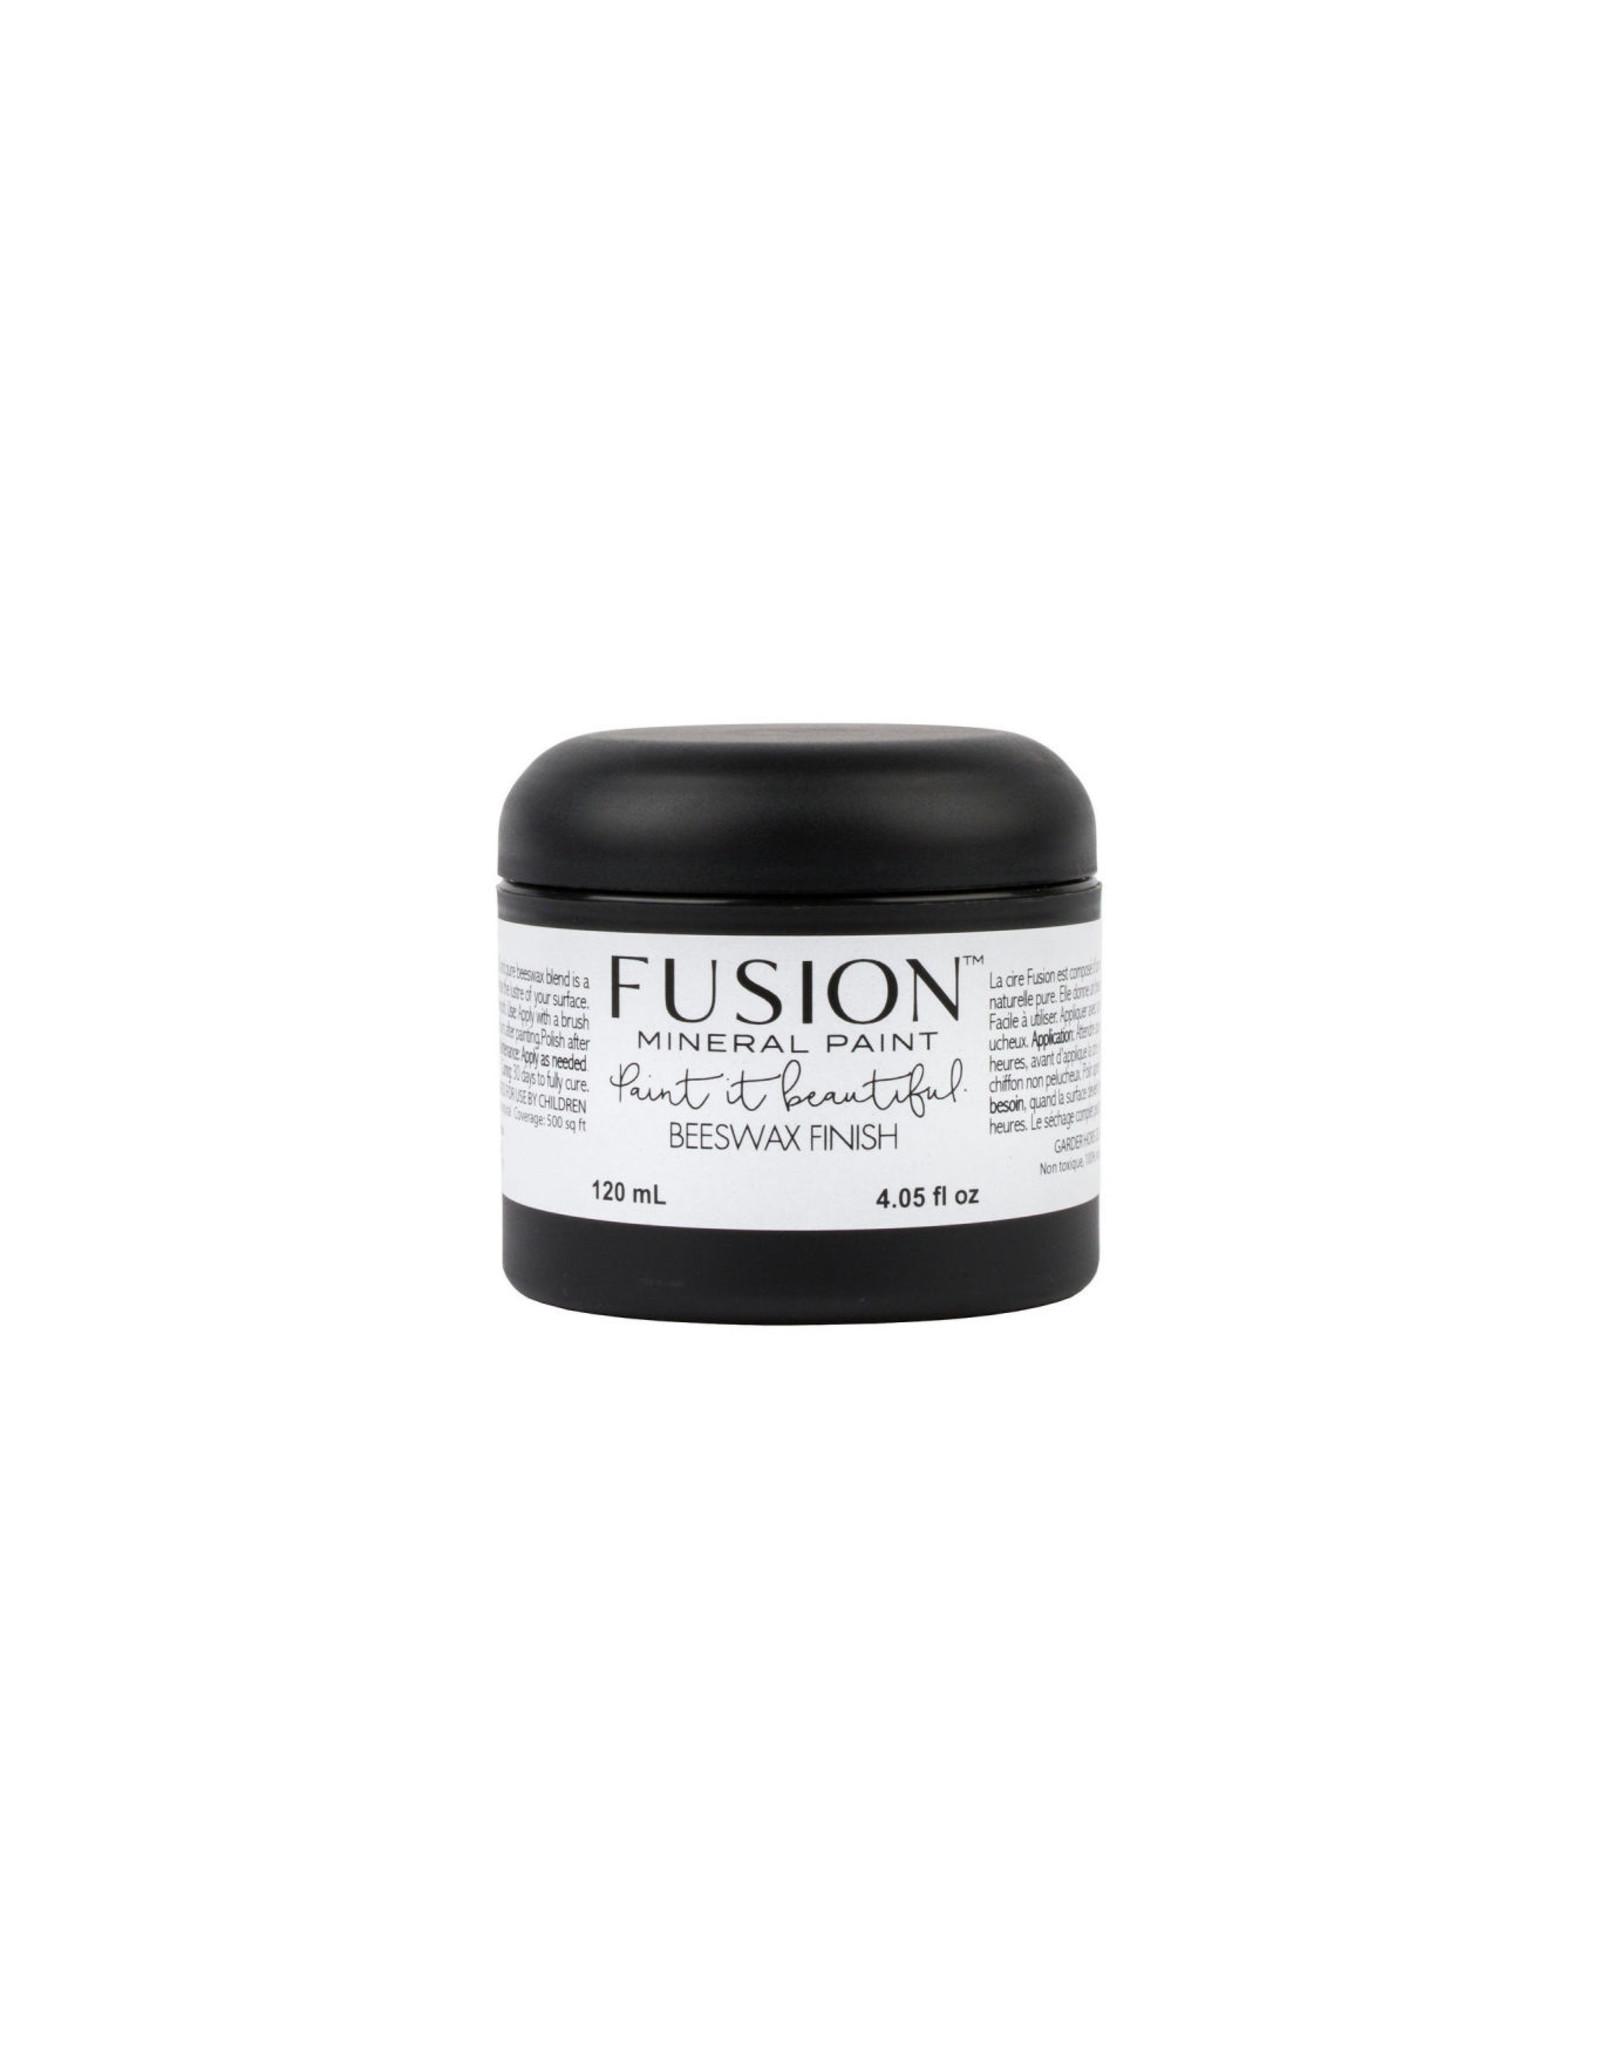 Fusion Mineral Paint Beeswax/Hemp Finish 120ml